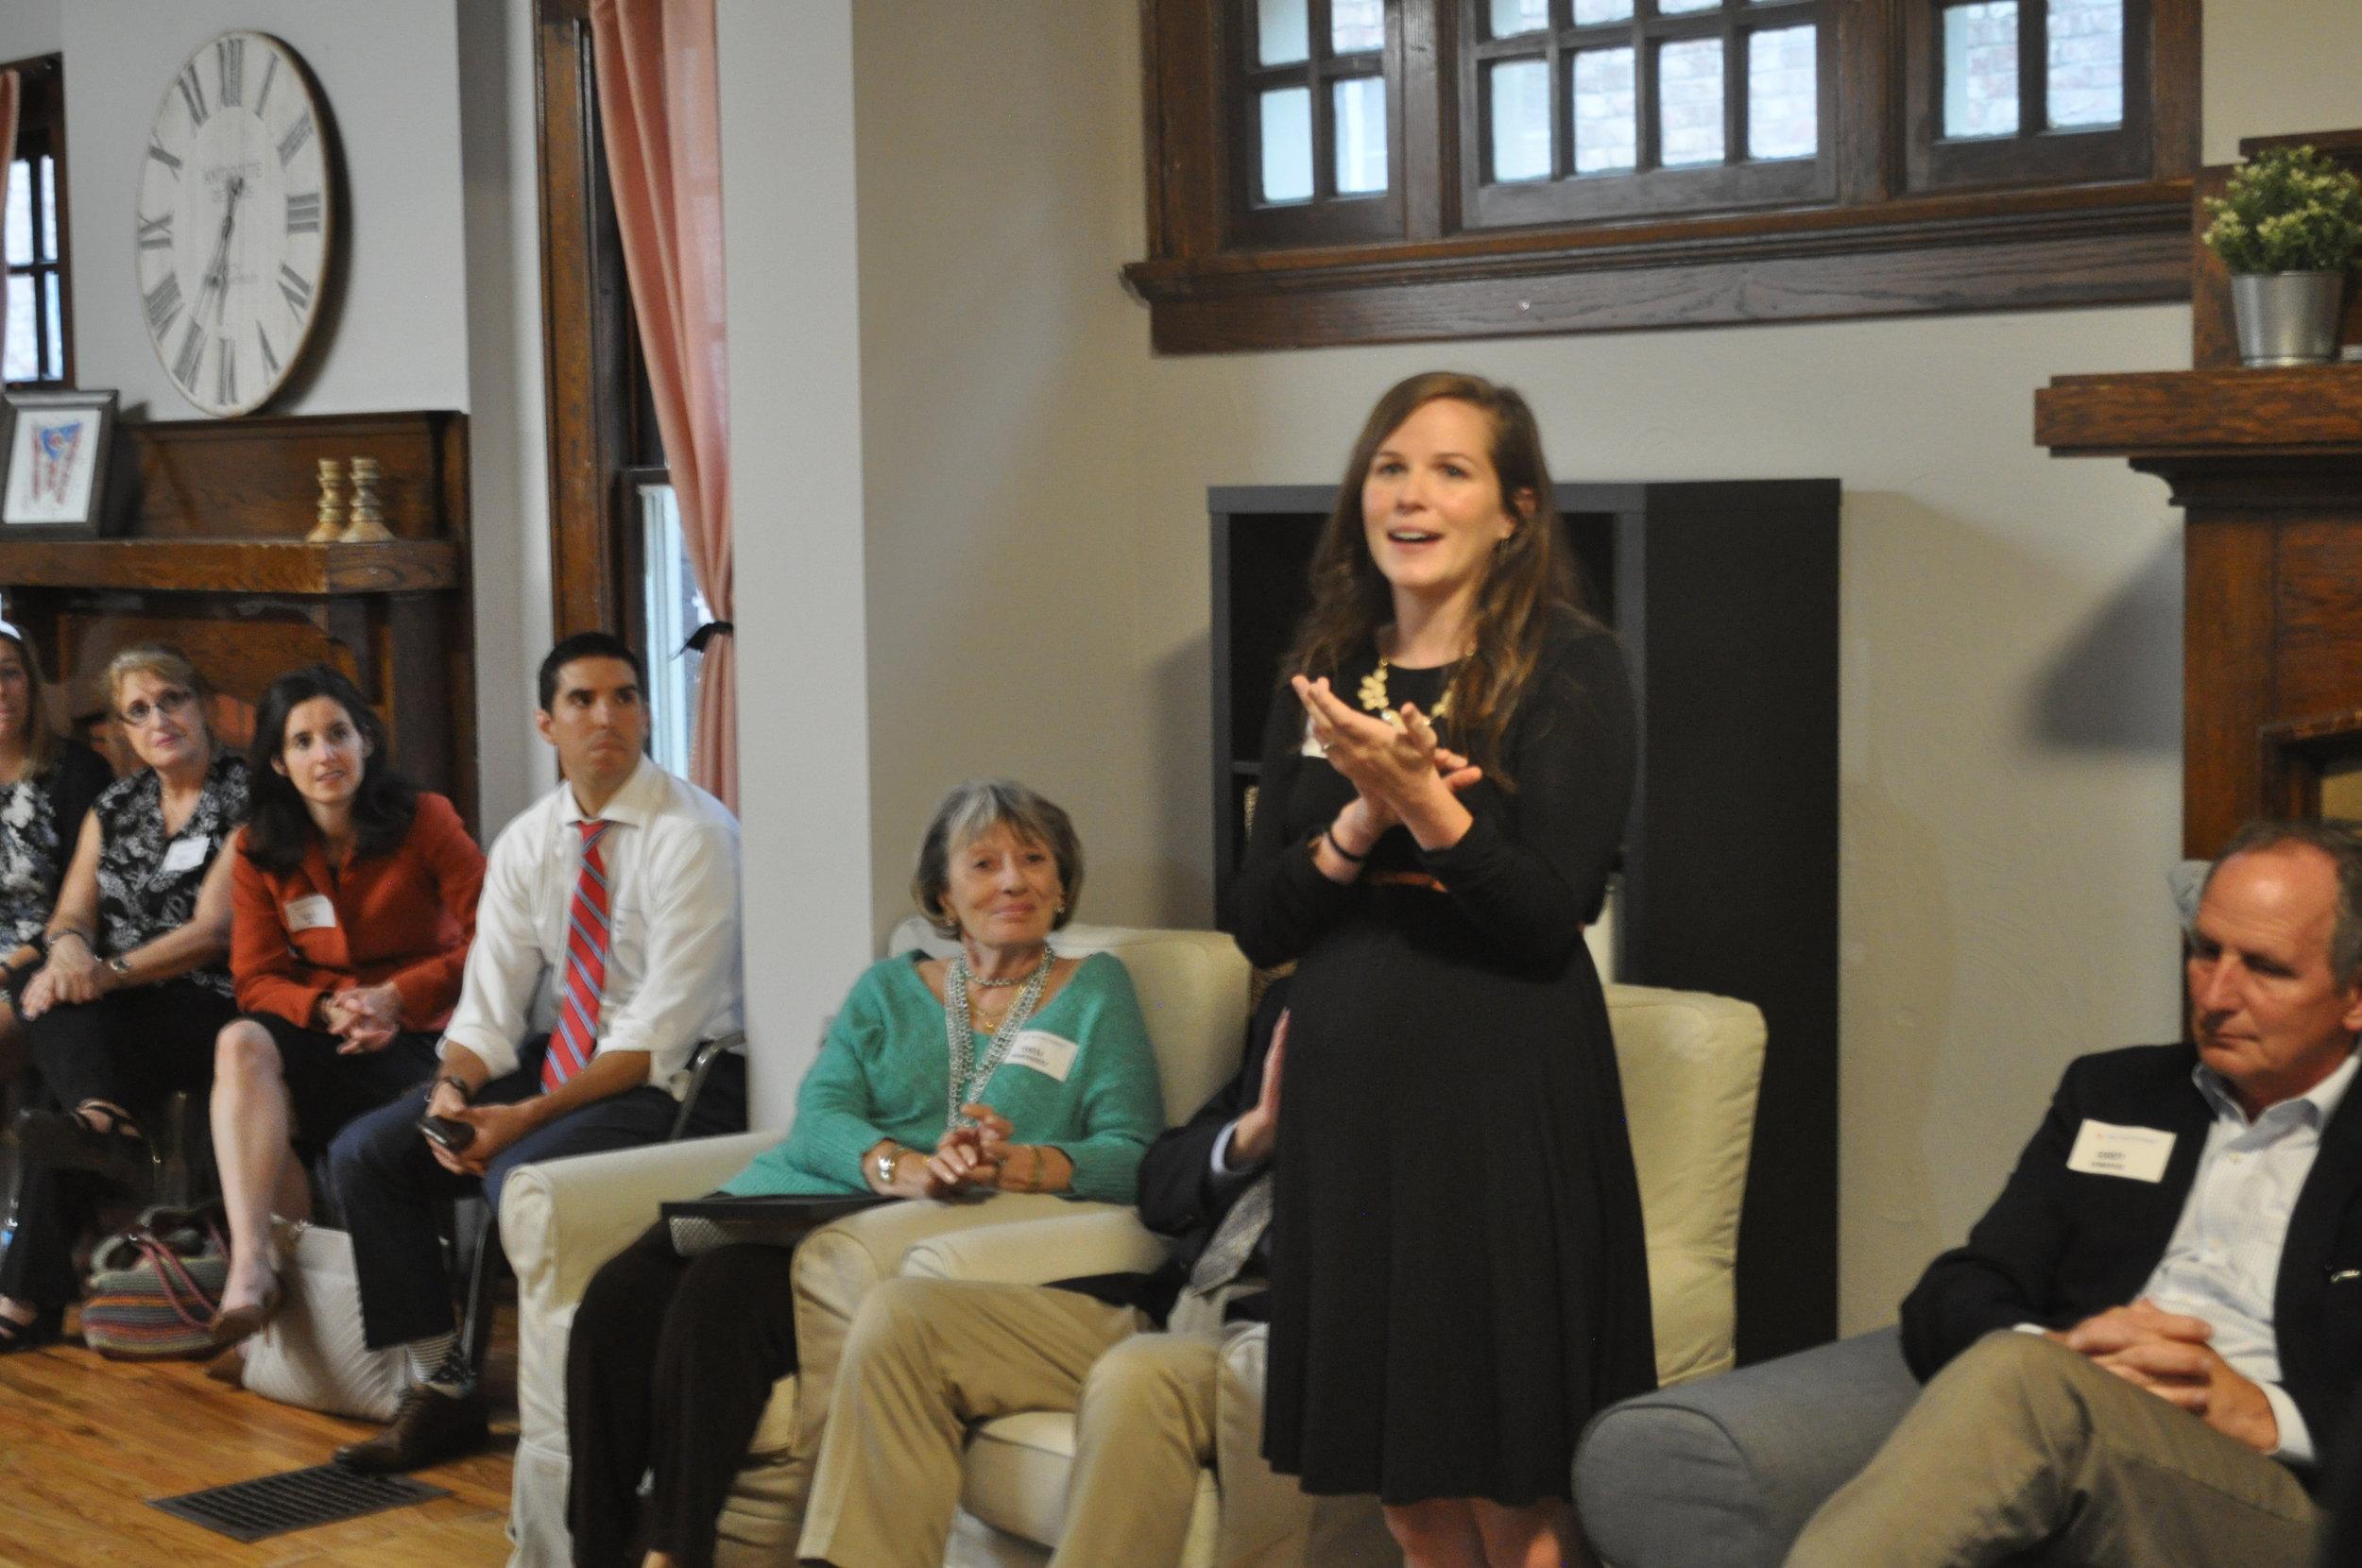 SPO Ohio Mission Director, Alissa Giles, describing the dream of having an SPO Women's House on OSU's South Campus